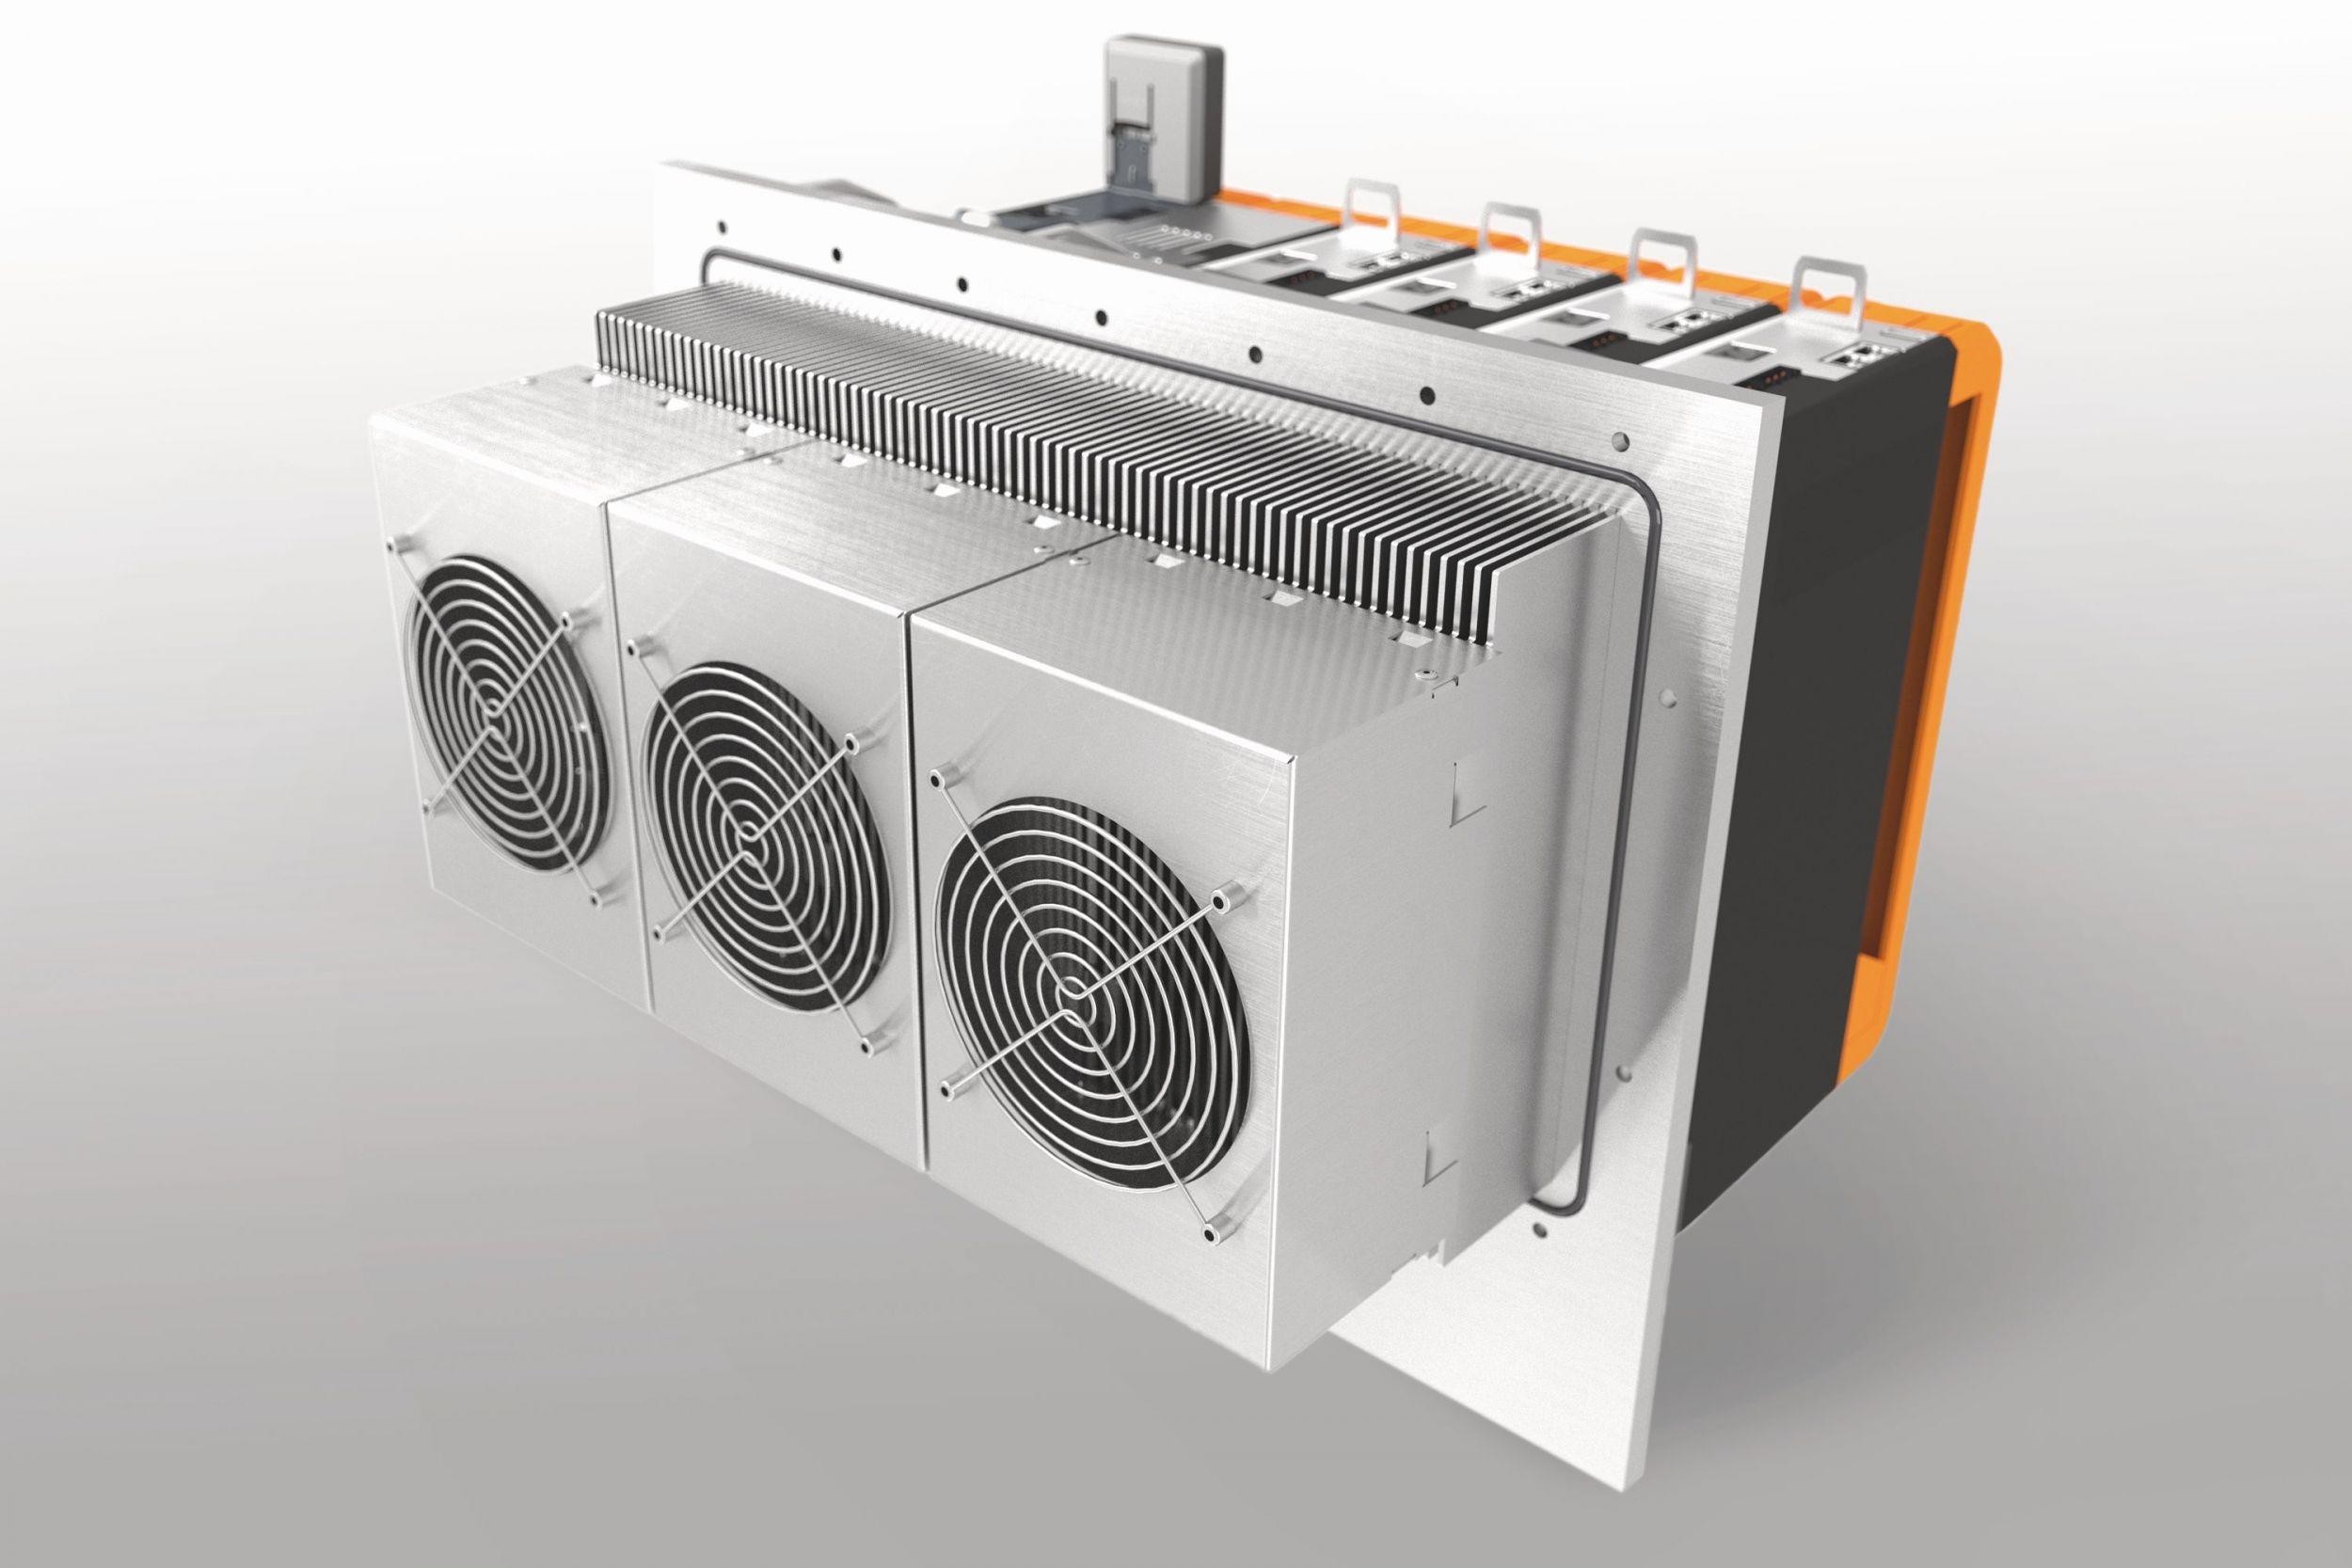 Servoverstärker mit modularem Kühlkonzept